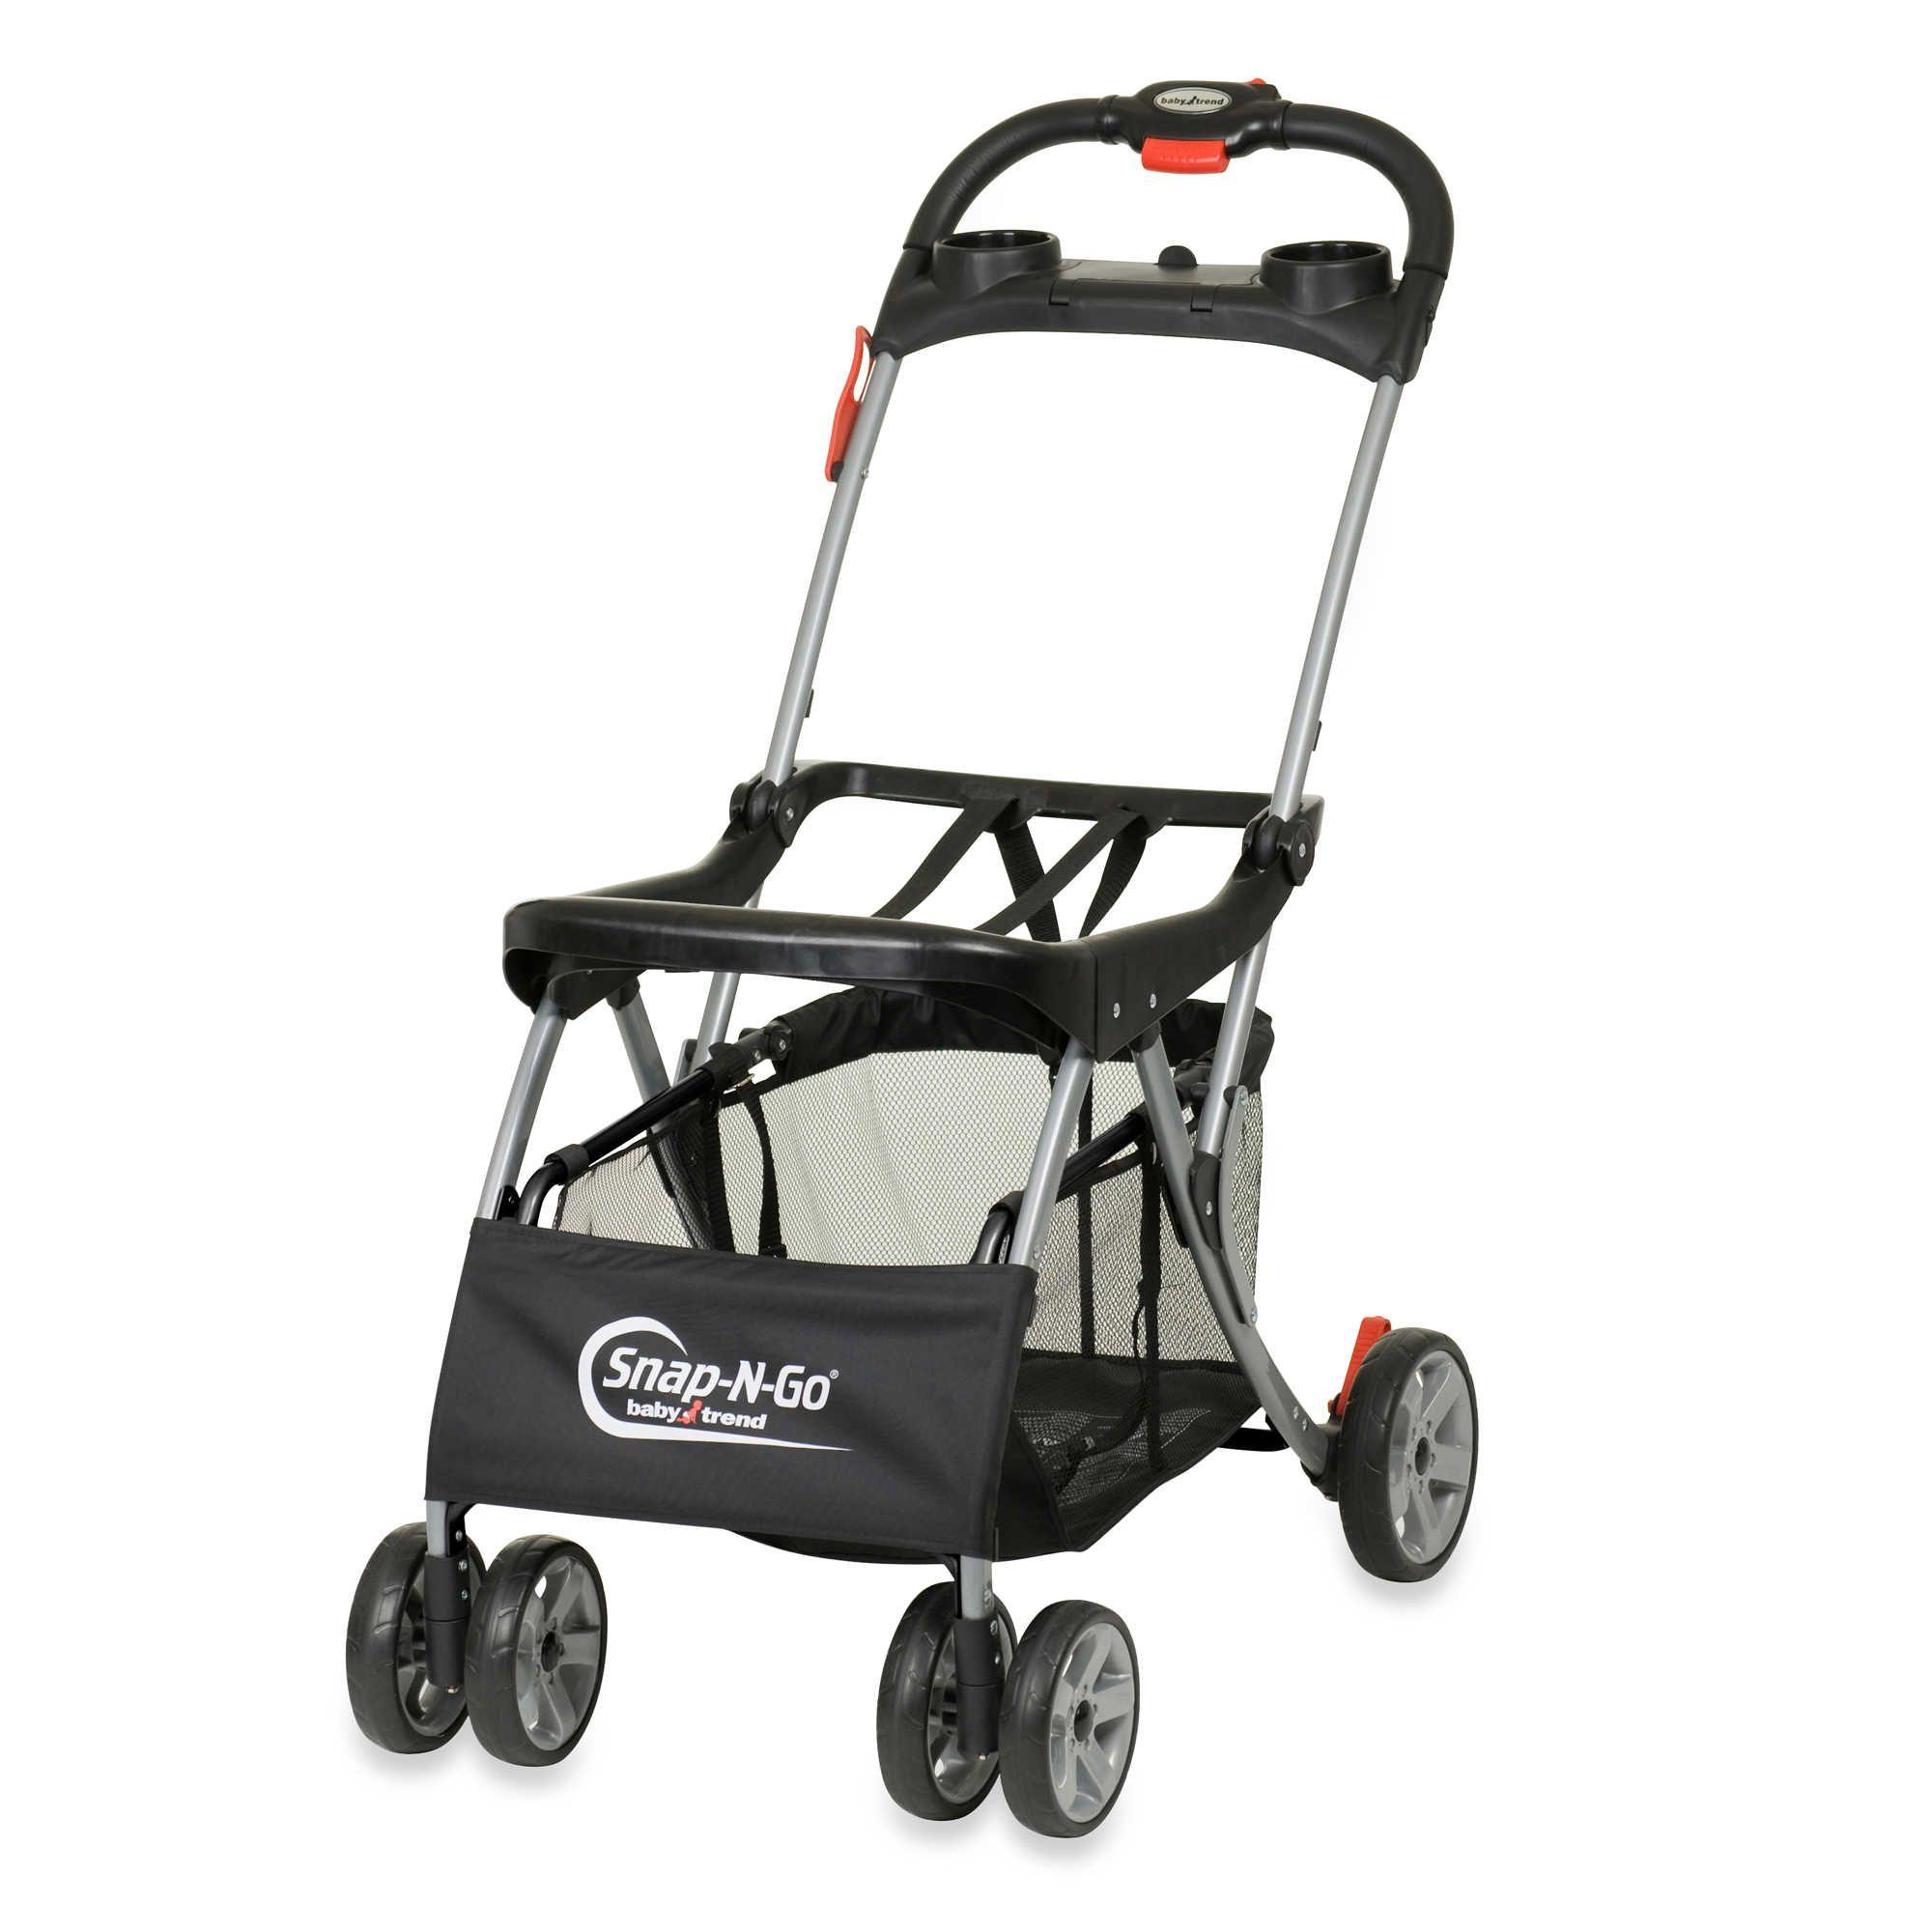 Luxus Baby Trend Snap Und Go Kinderwagen In Babyequipment